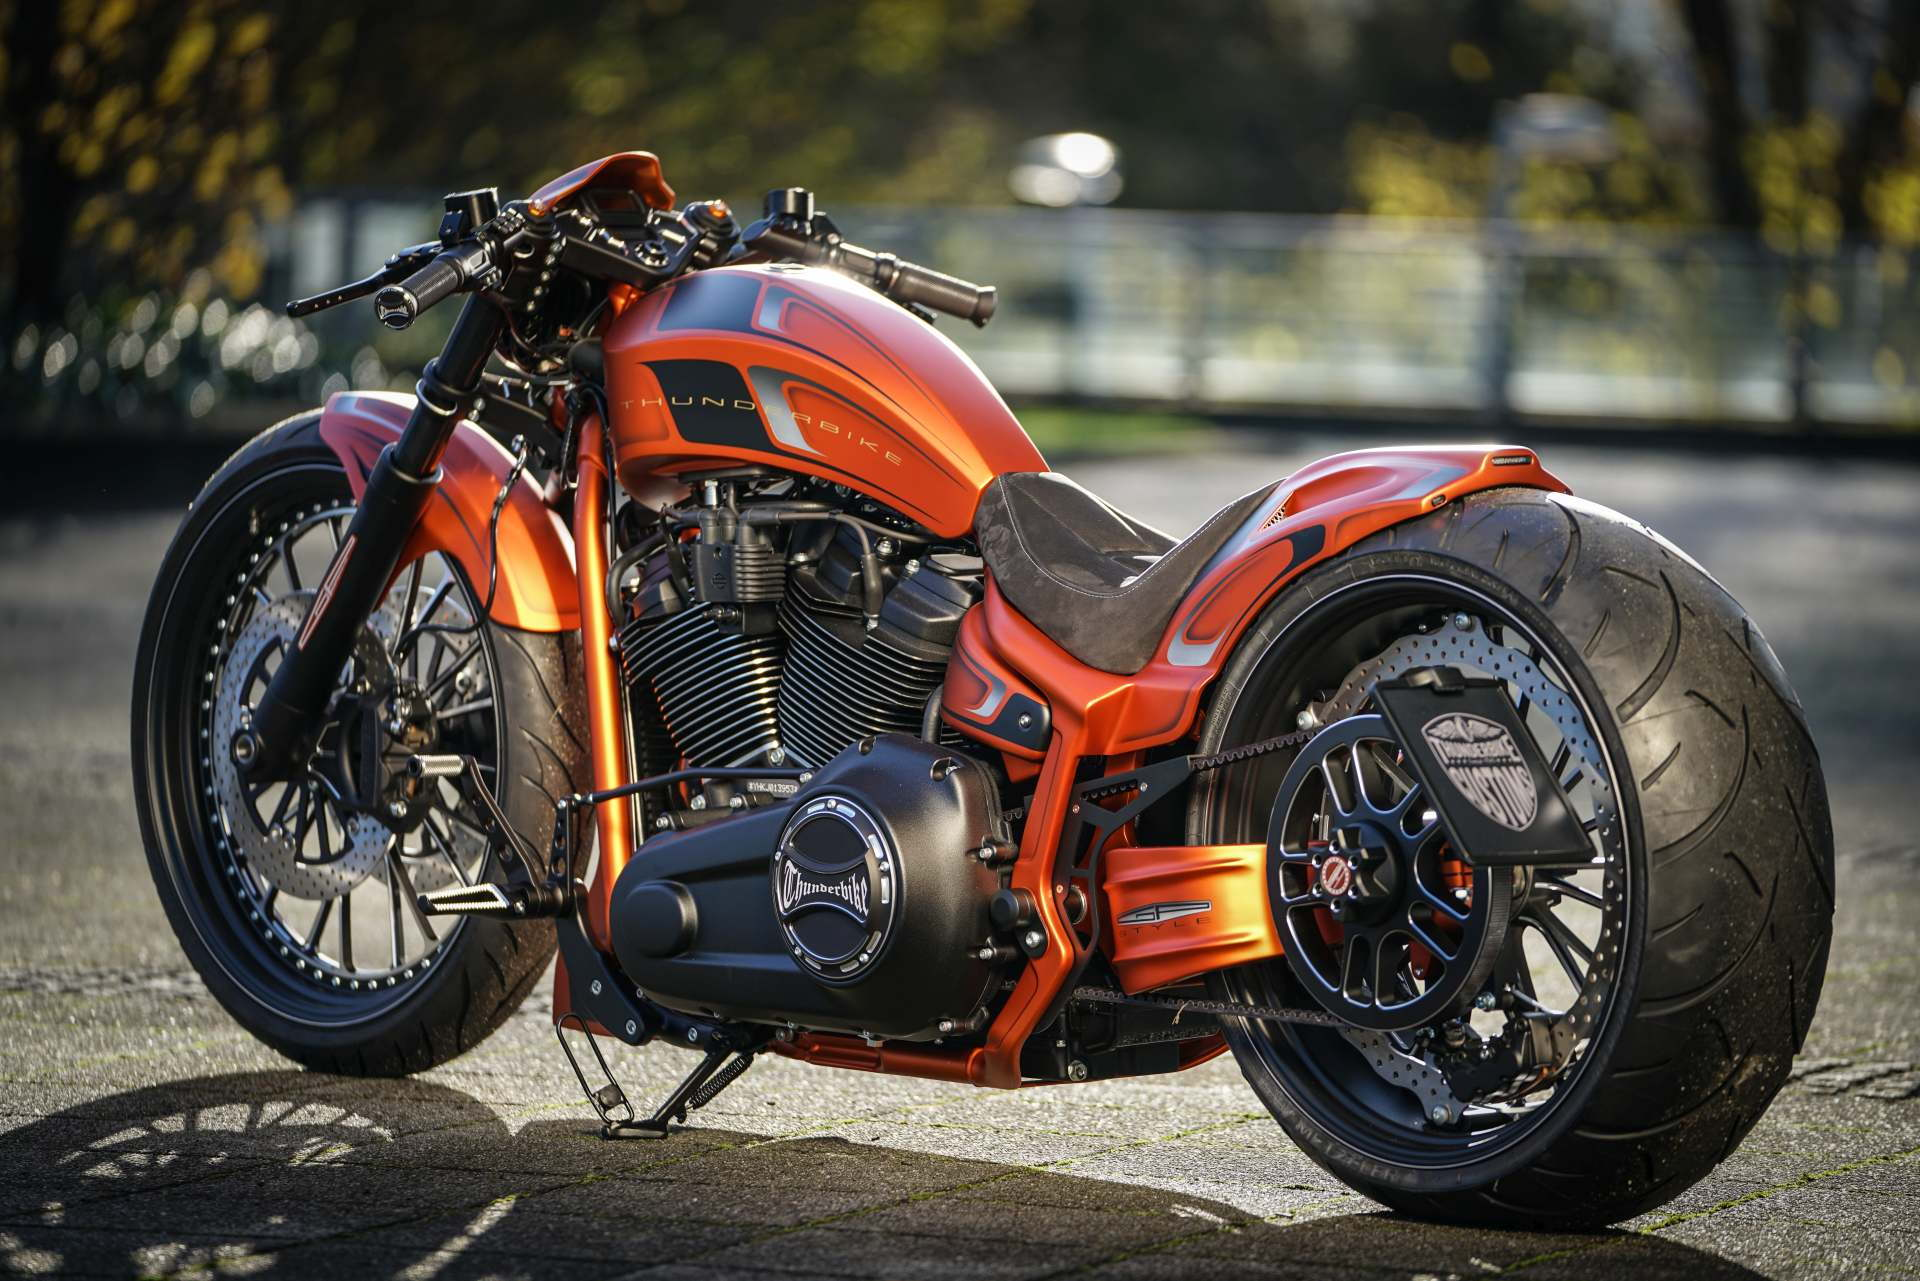 Harley Davidson Breakout For Sale >> Thunderbike Breakout '18 - Harley Davidson Forums